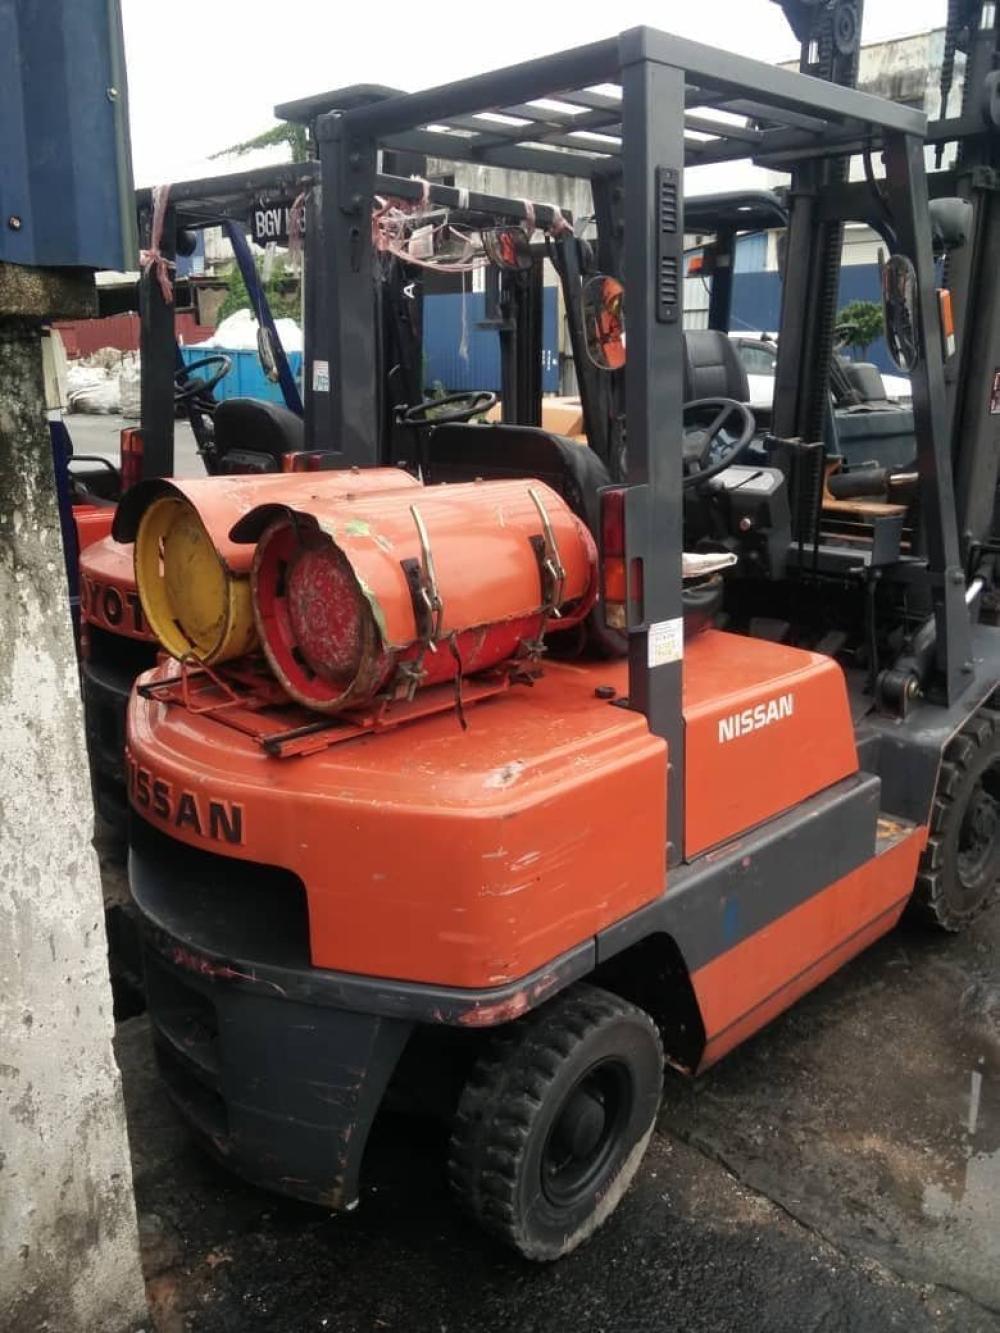 NISSAN PJO2 Nissan Seremban, Negeri Sembilan (NS), Malaysia, Senawang Forklift Supplier, Supply, Supplies, Rental | Uniforce Materials Handling (M) Sdn Bhd